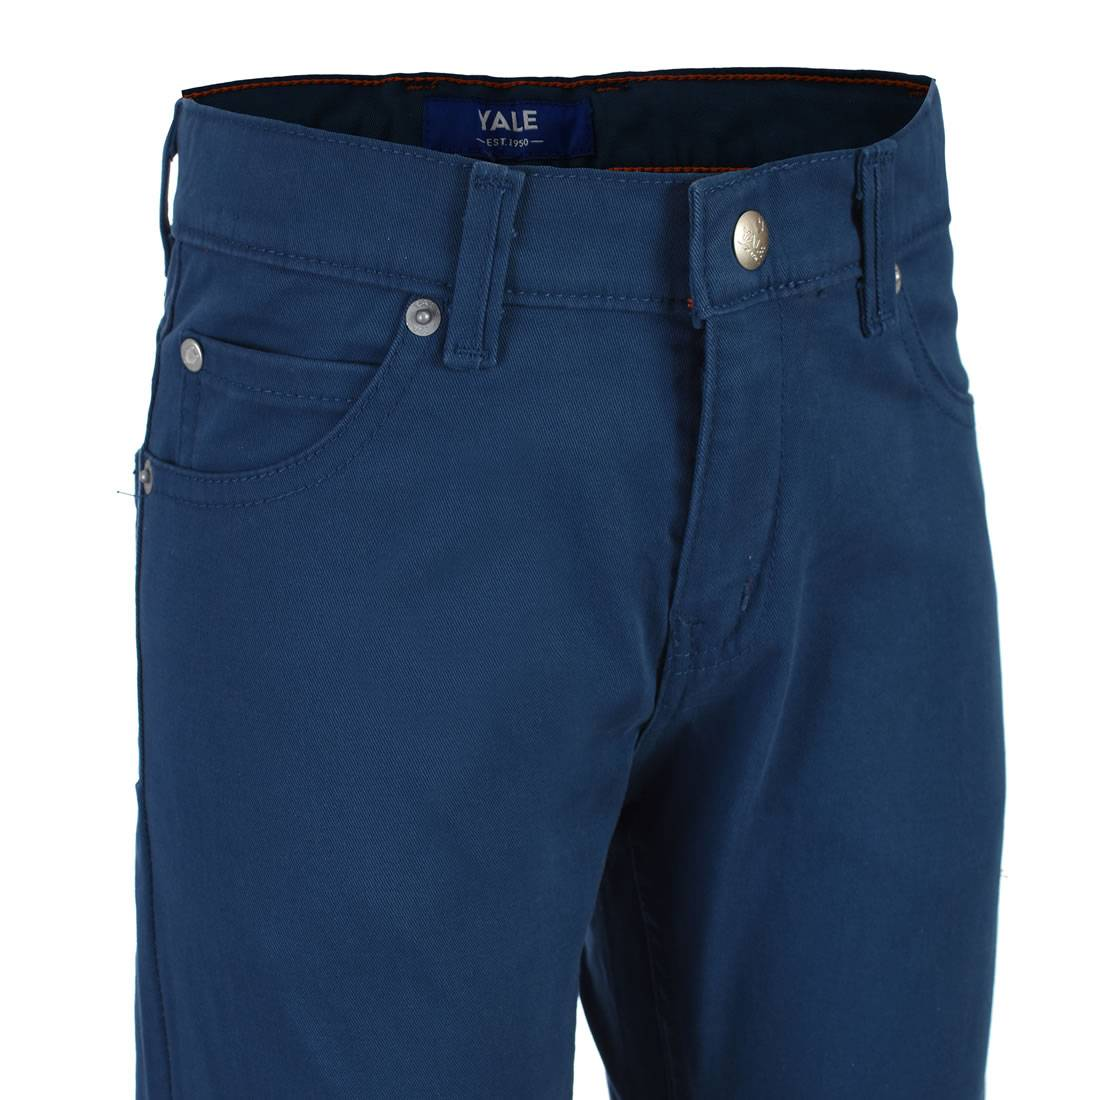 021109065414-03-Pantalon-Vaquero-Boys-Gabardina-Con-Elastano-Skinny-Fit-Cintura-Ajustable-Azul-Plumbago-yale